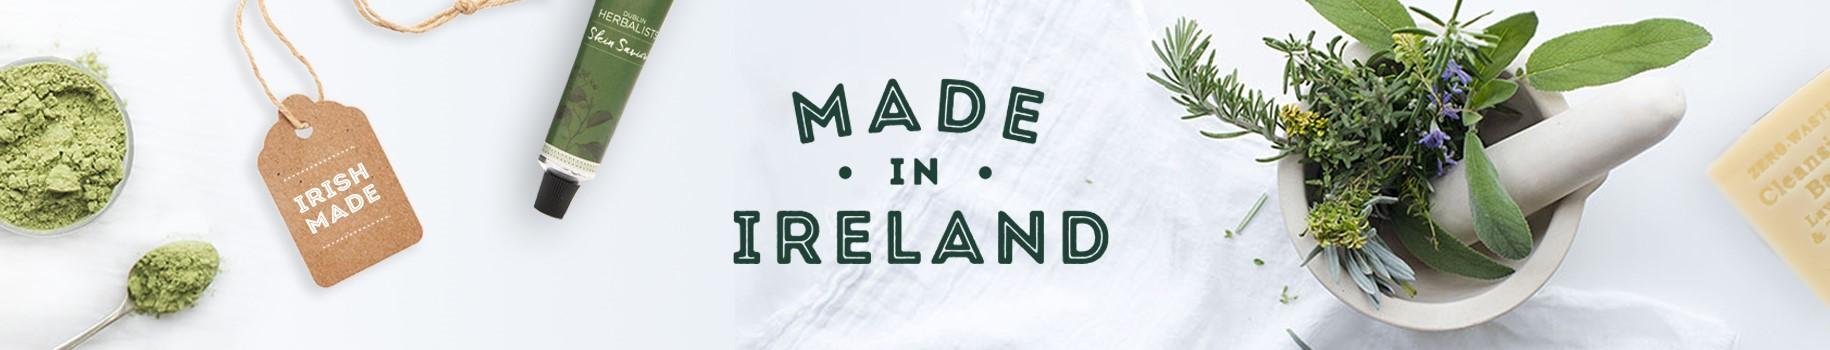 Nourish Made In Ireland - Household Home